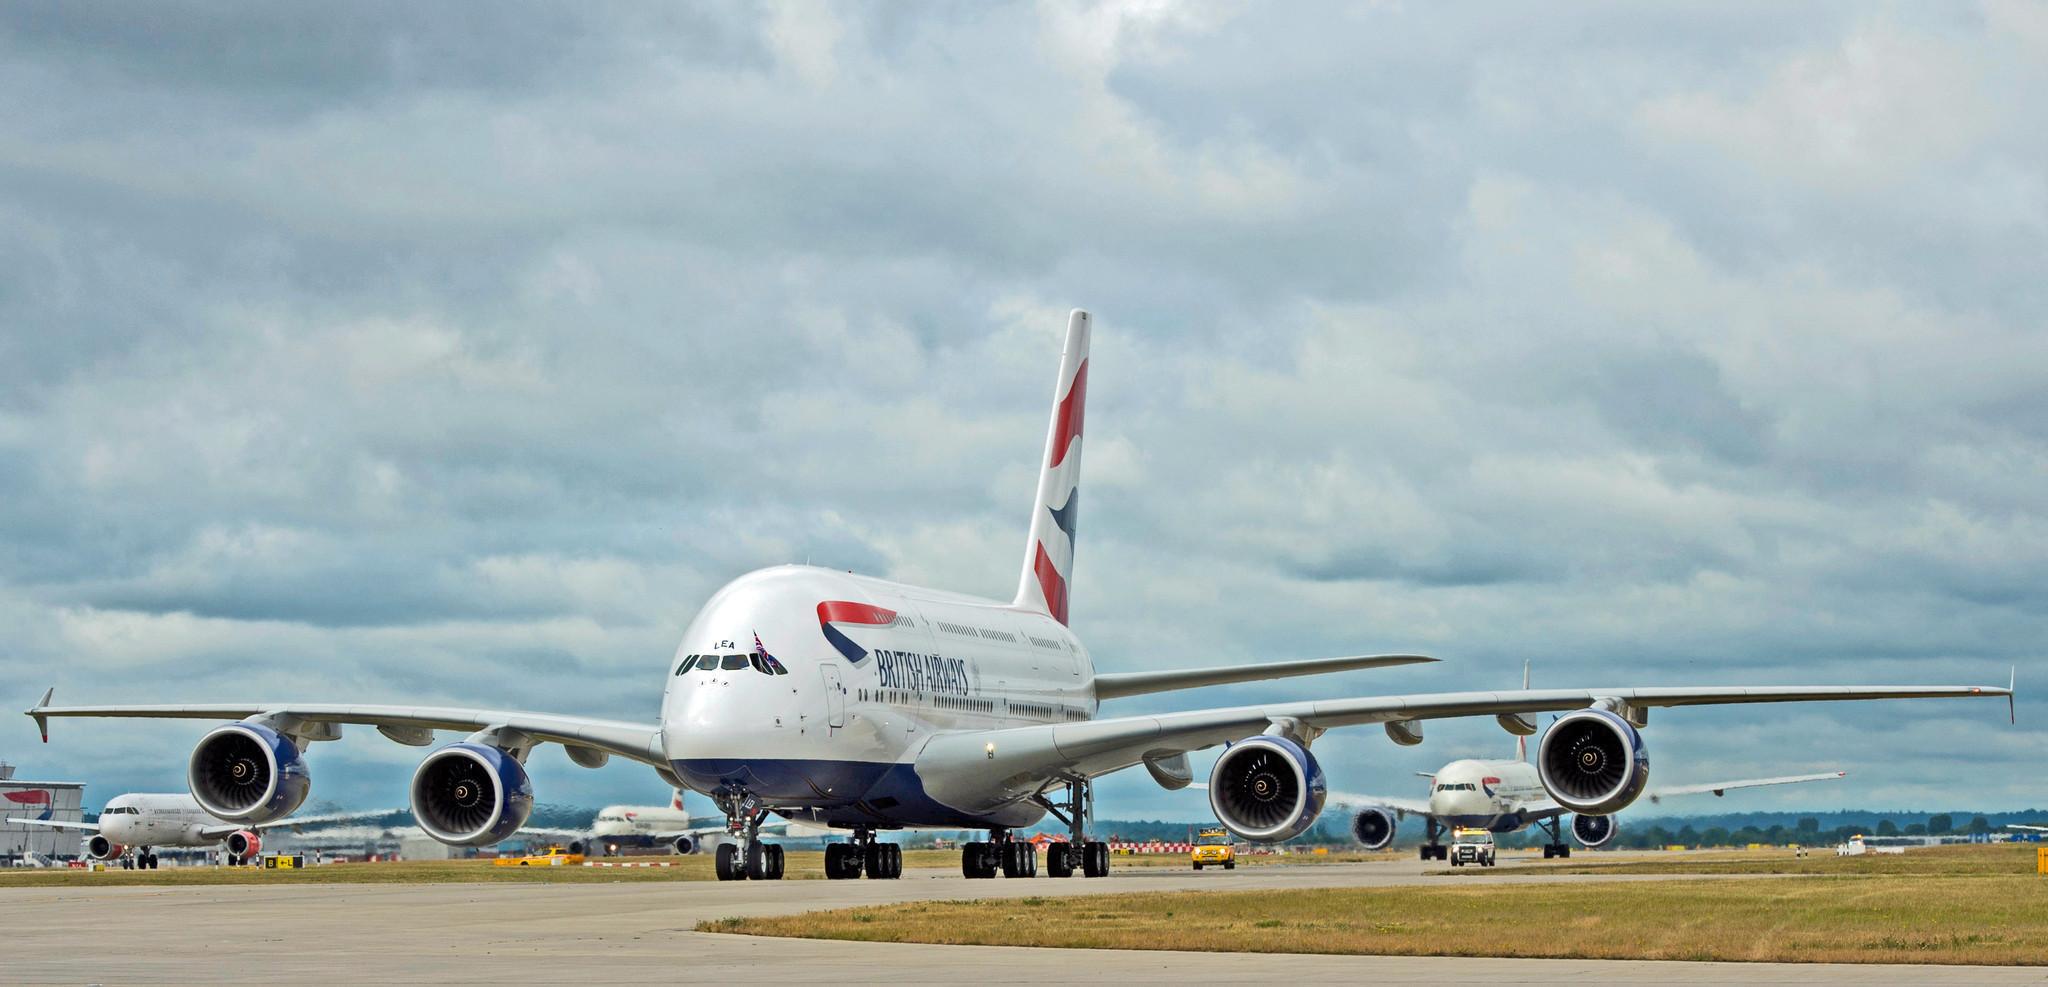 hot sale online 1bdb6 c1e64 ... Orlando-bound flight diverts to Boston due to unruly passenger -  Orlando Sentinel ...